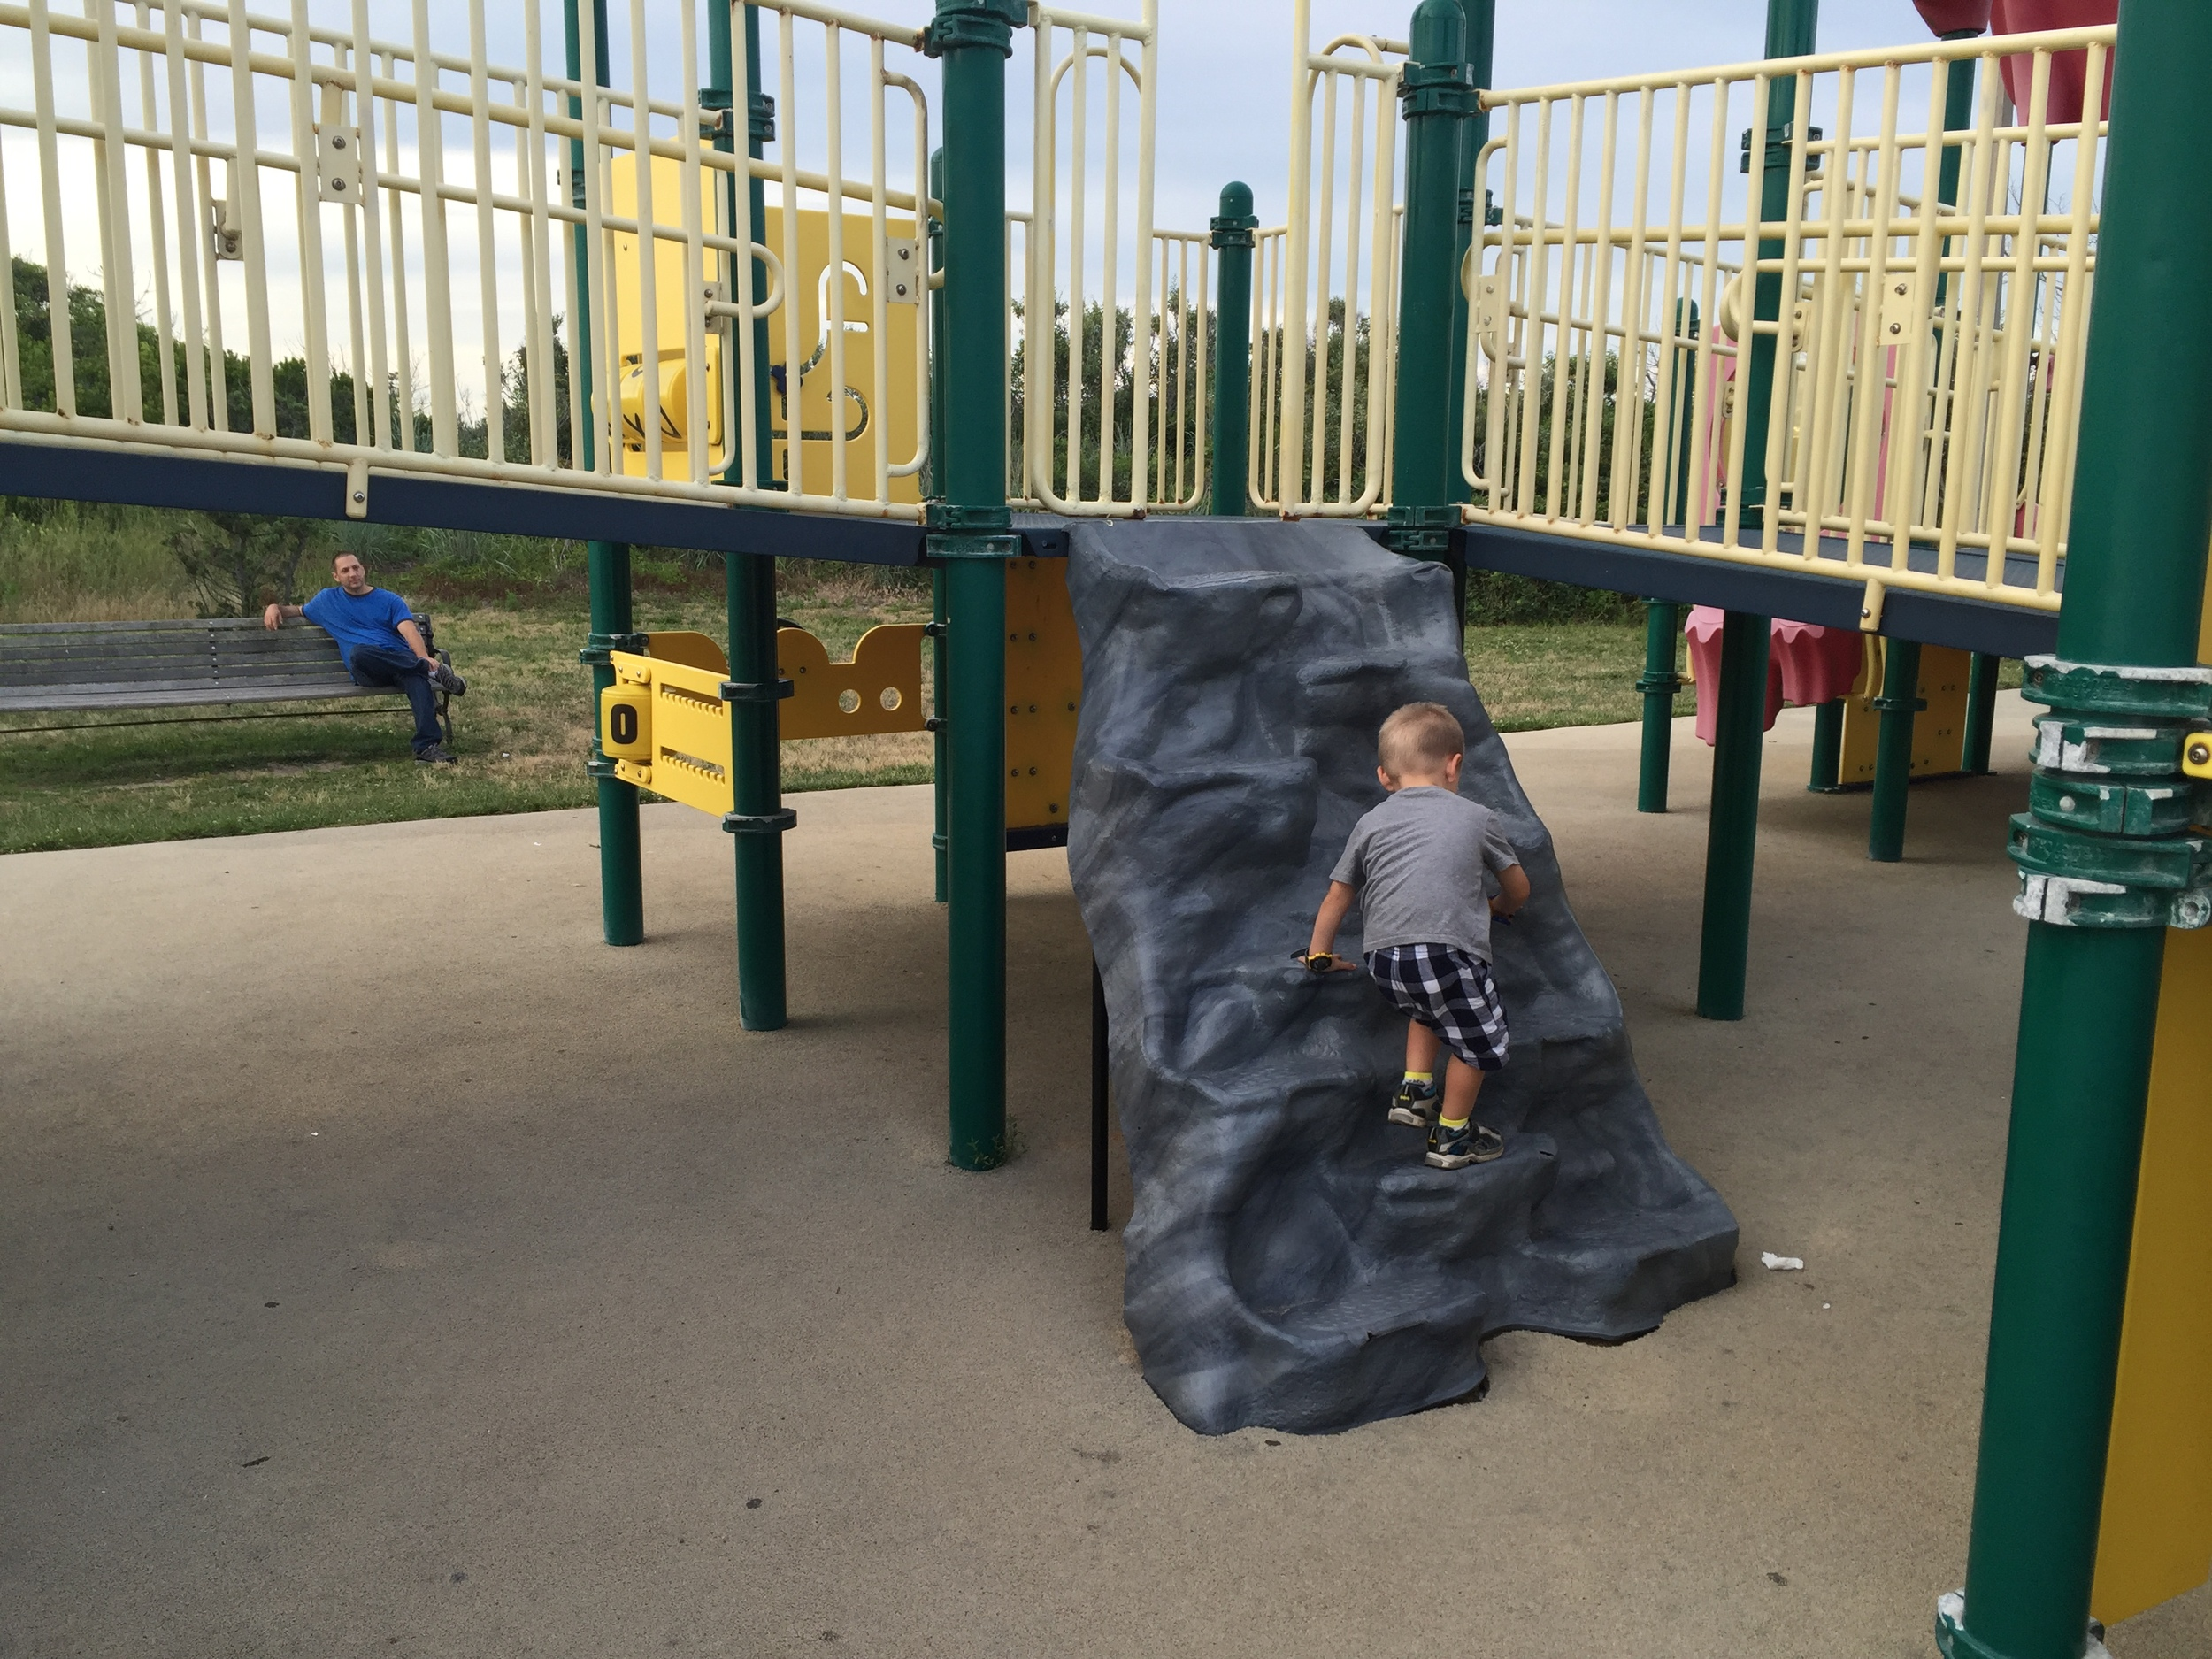 Rock climb at Boardwalk Playground at Jones Beach